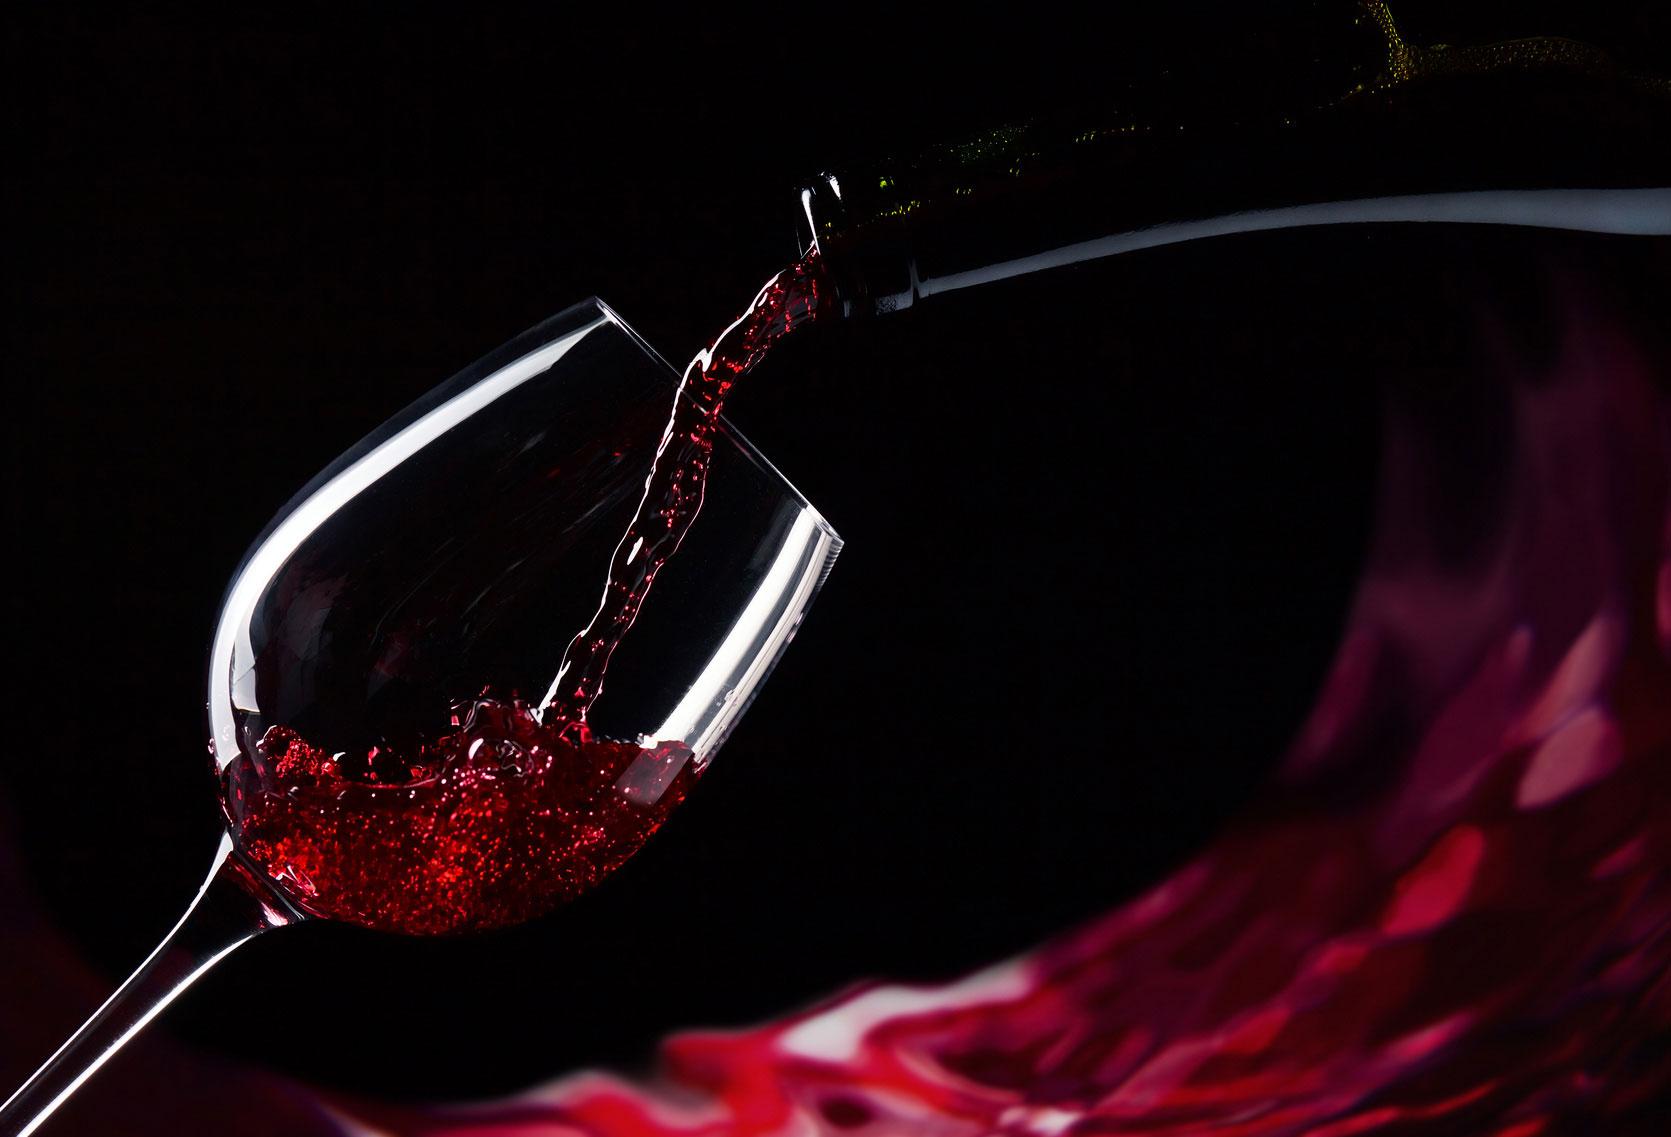 High Resolution Wallpaper   Wine 1671x1137 px